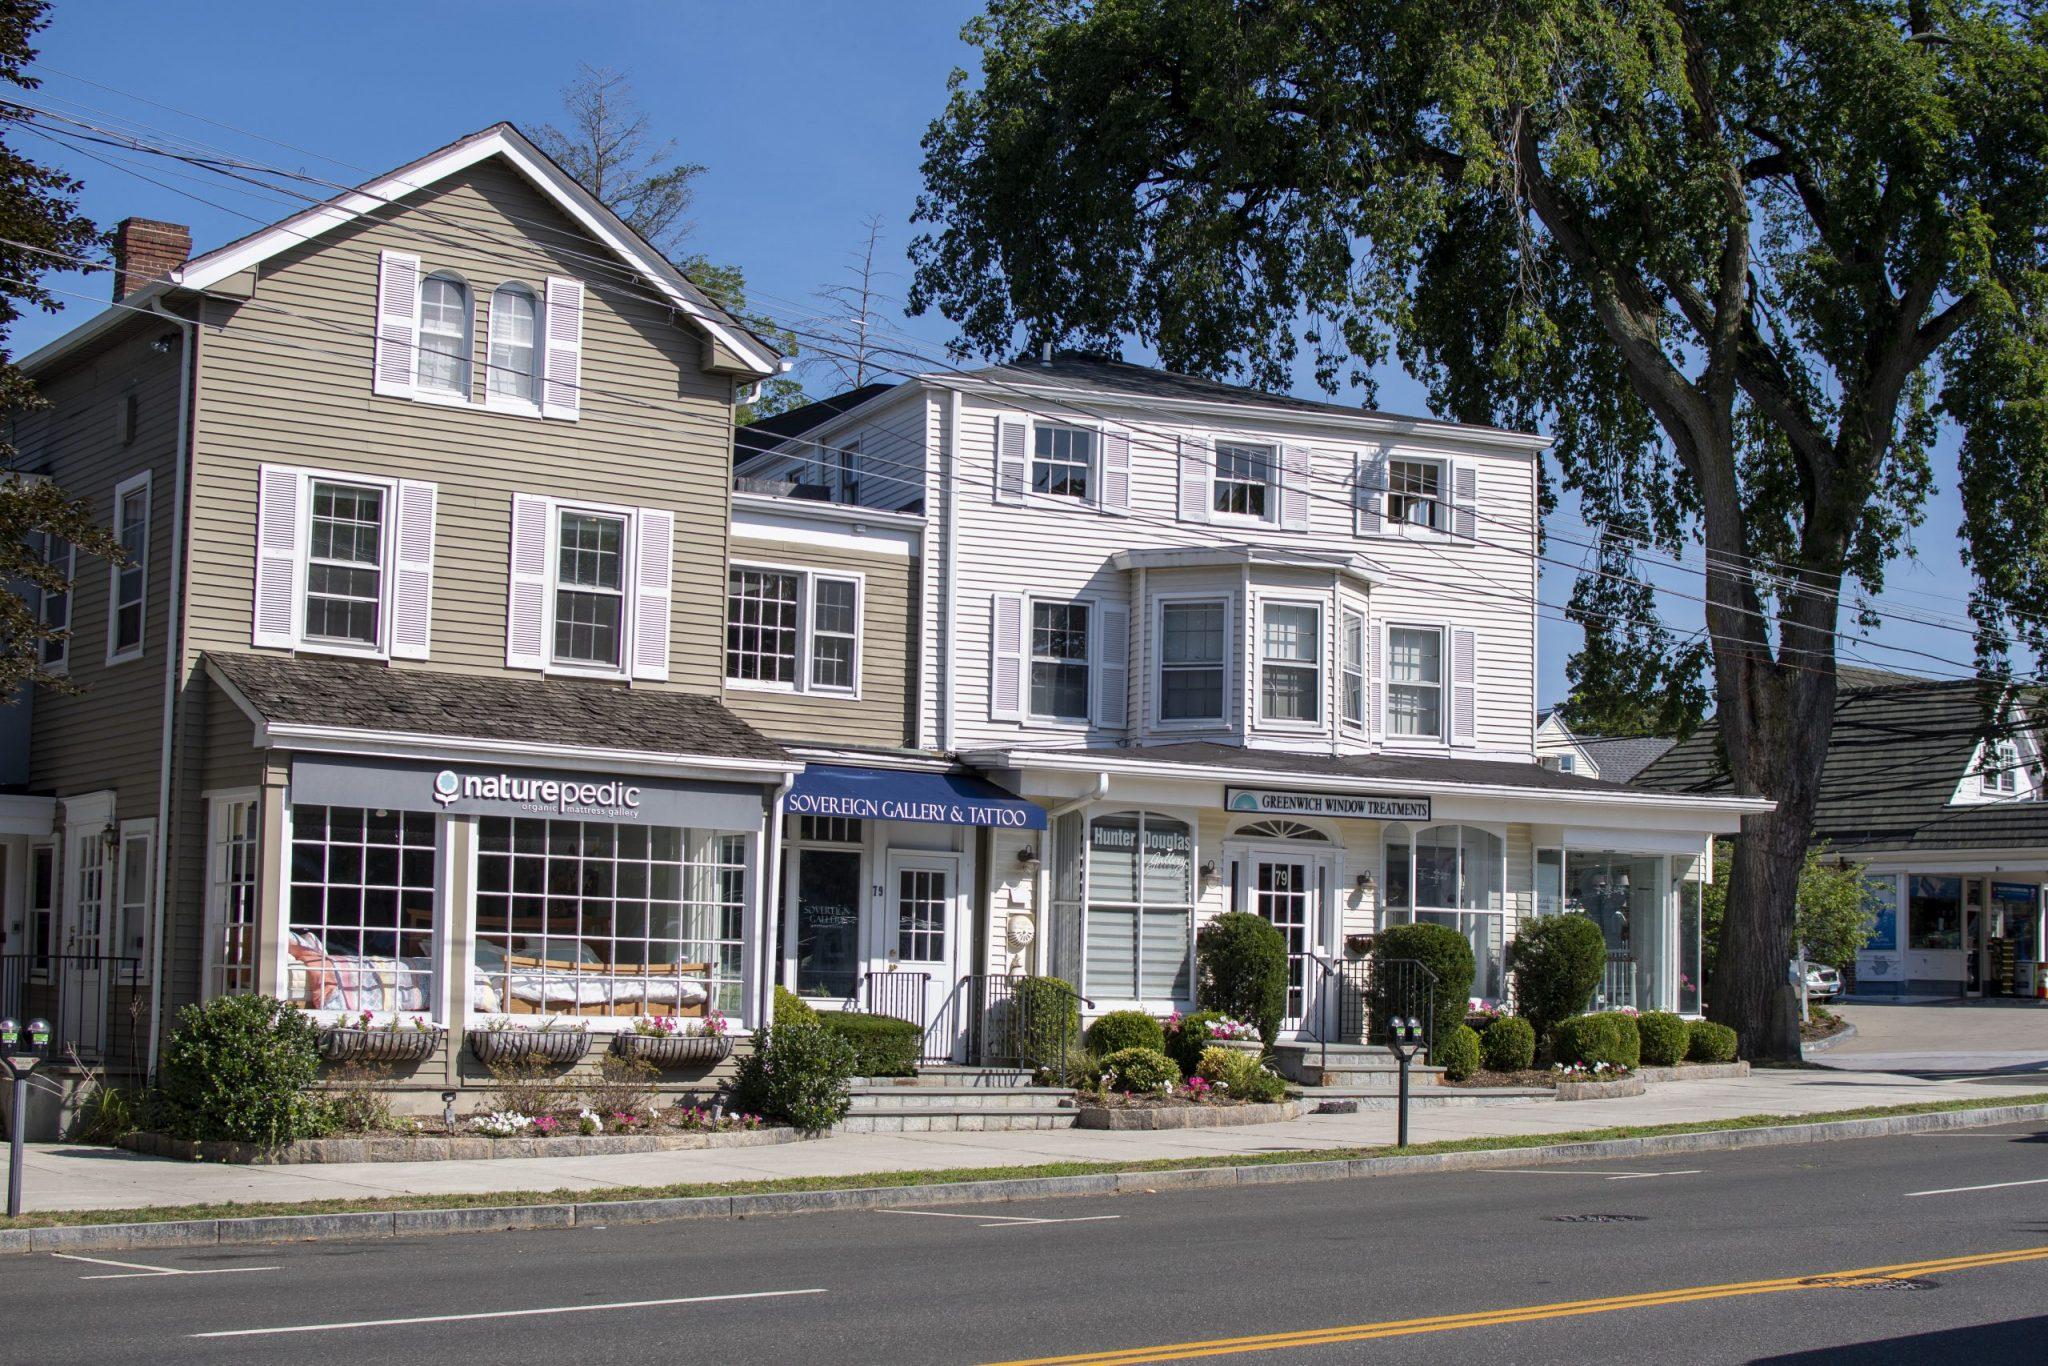 79 East Putnam Avenue – Greenwich, CT 06830 – 2,023 sq. ft.